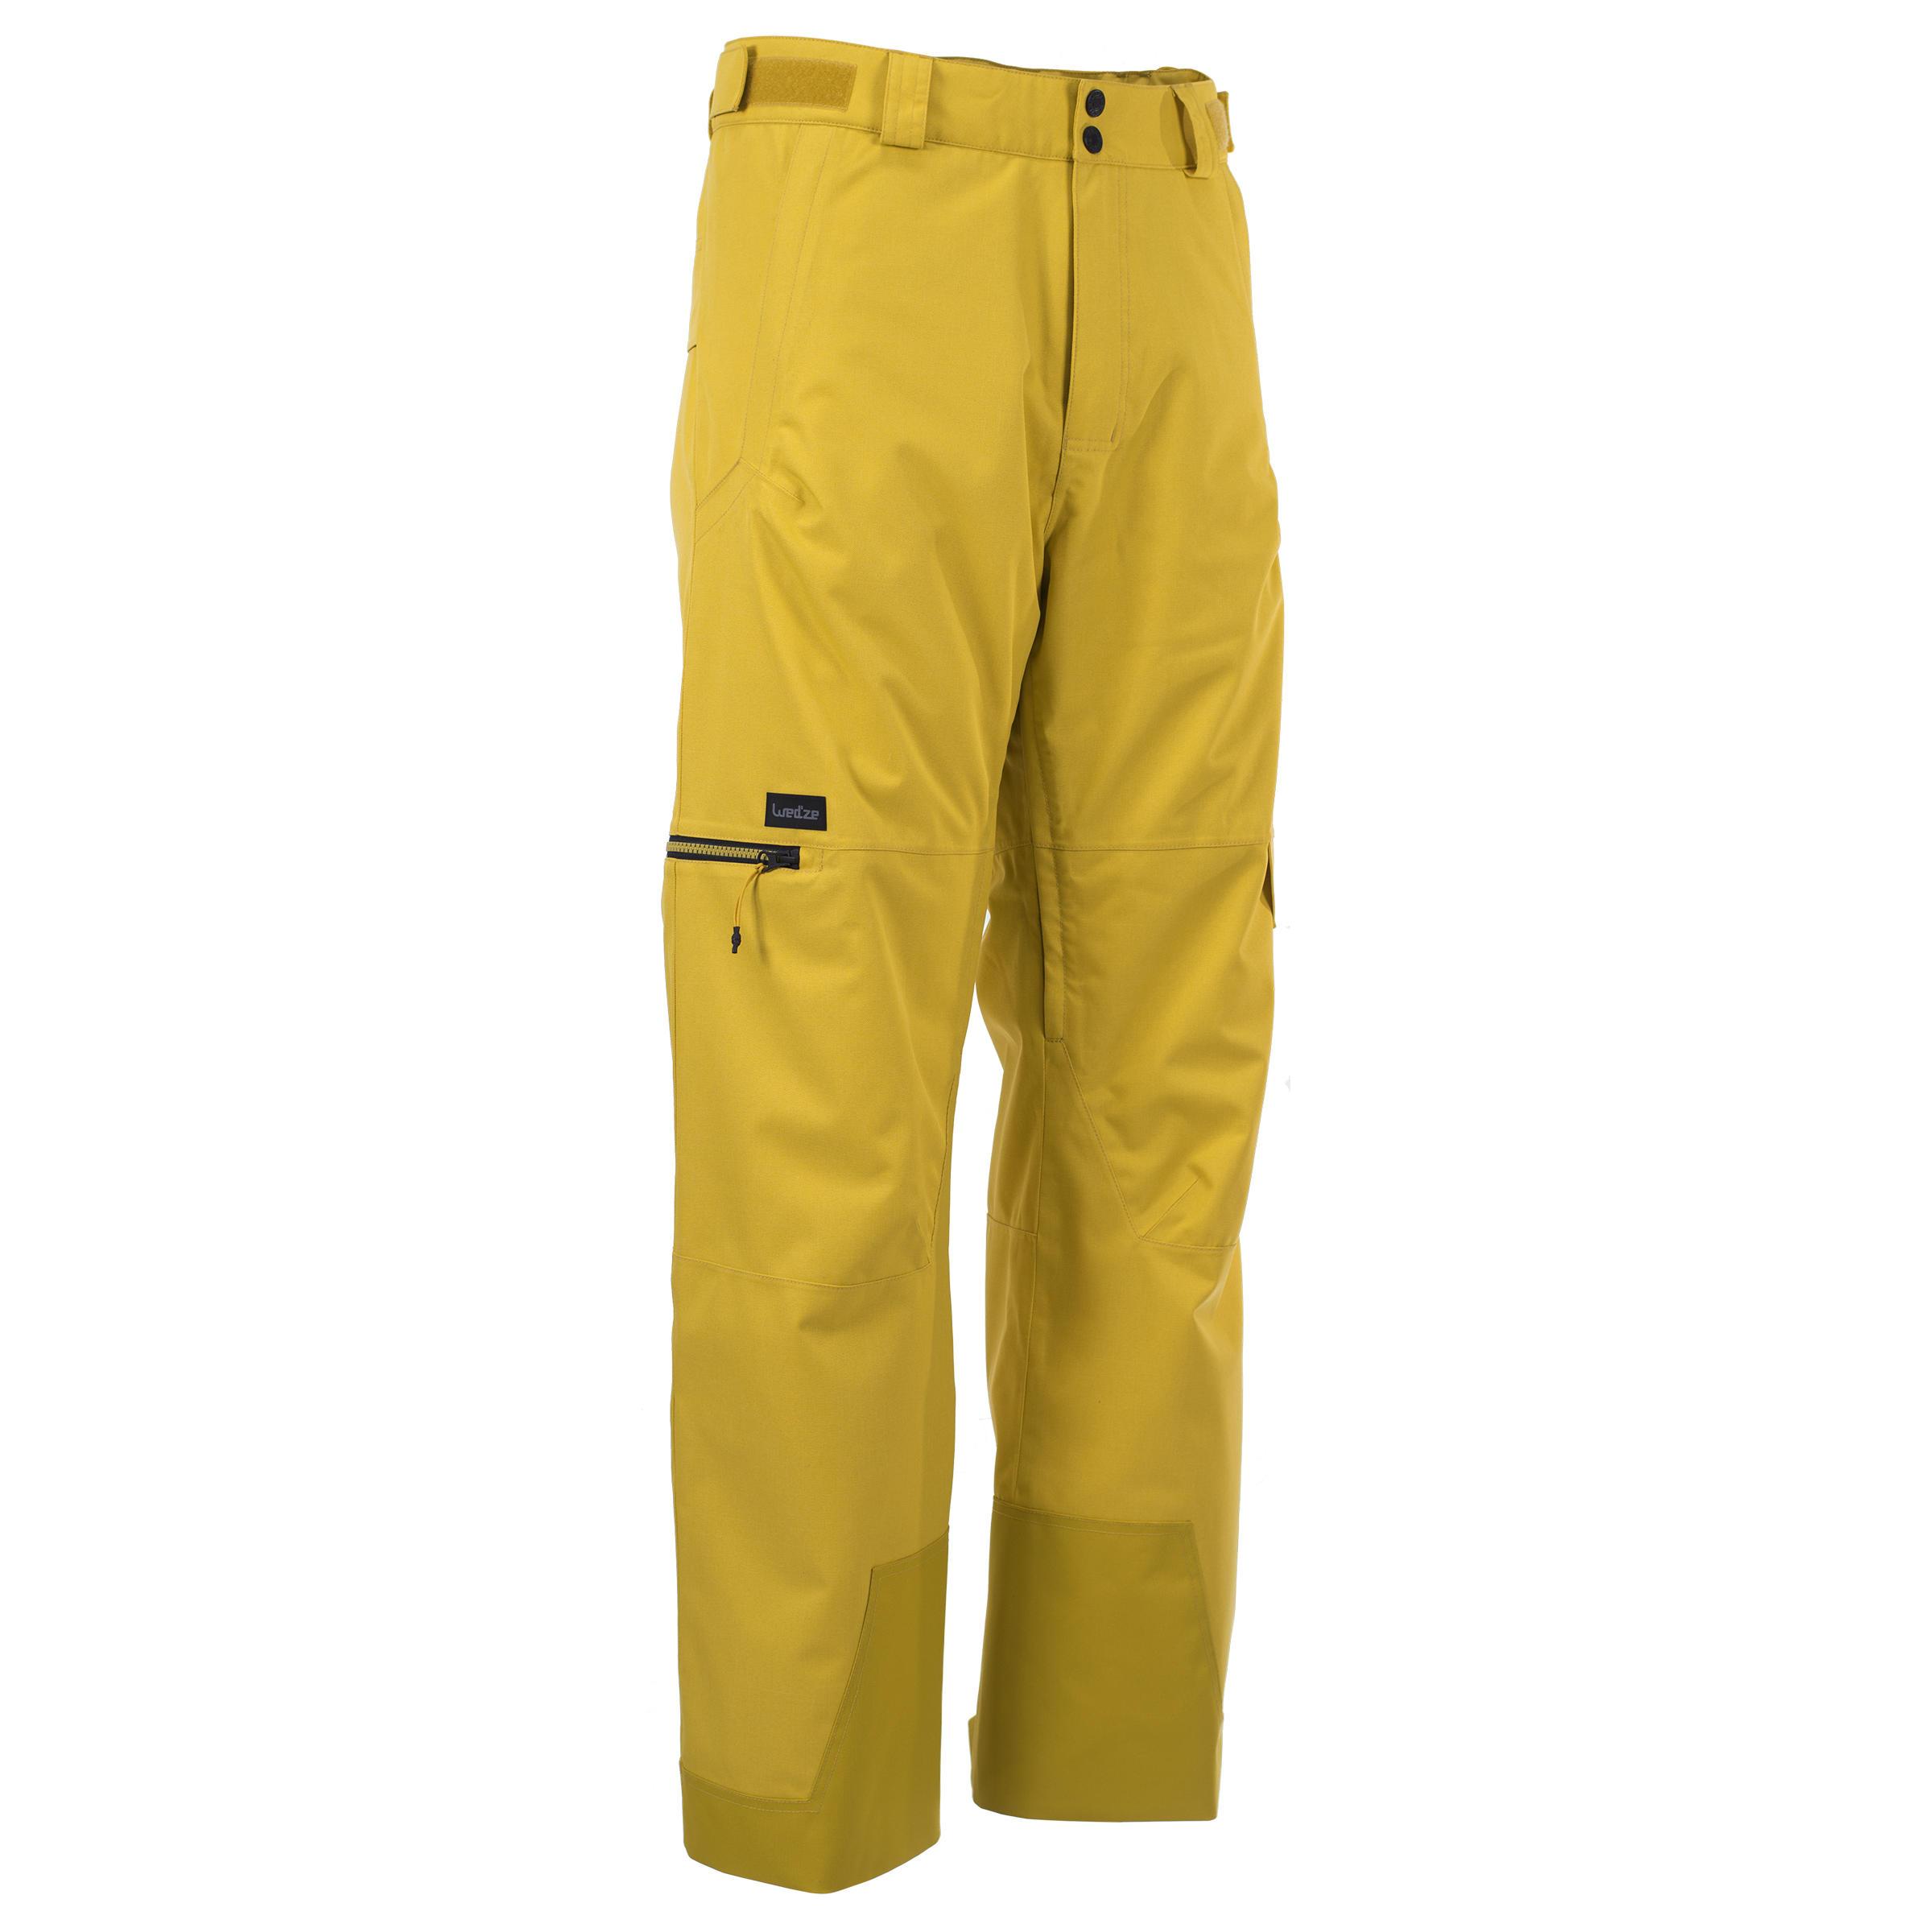 Snowboardhose SNB PA 500 Herren gelb   Sportbekleidung > Sporthosen > Snowboardhosen   Wed'ze